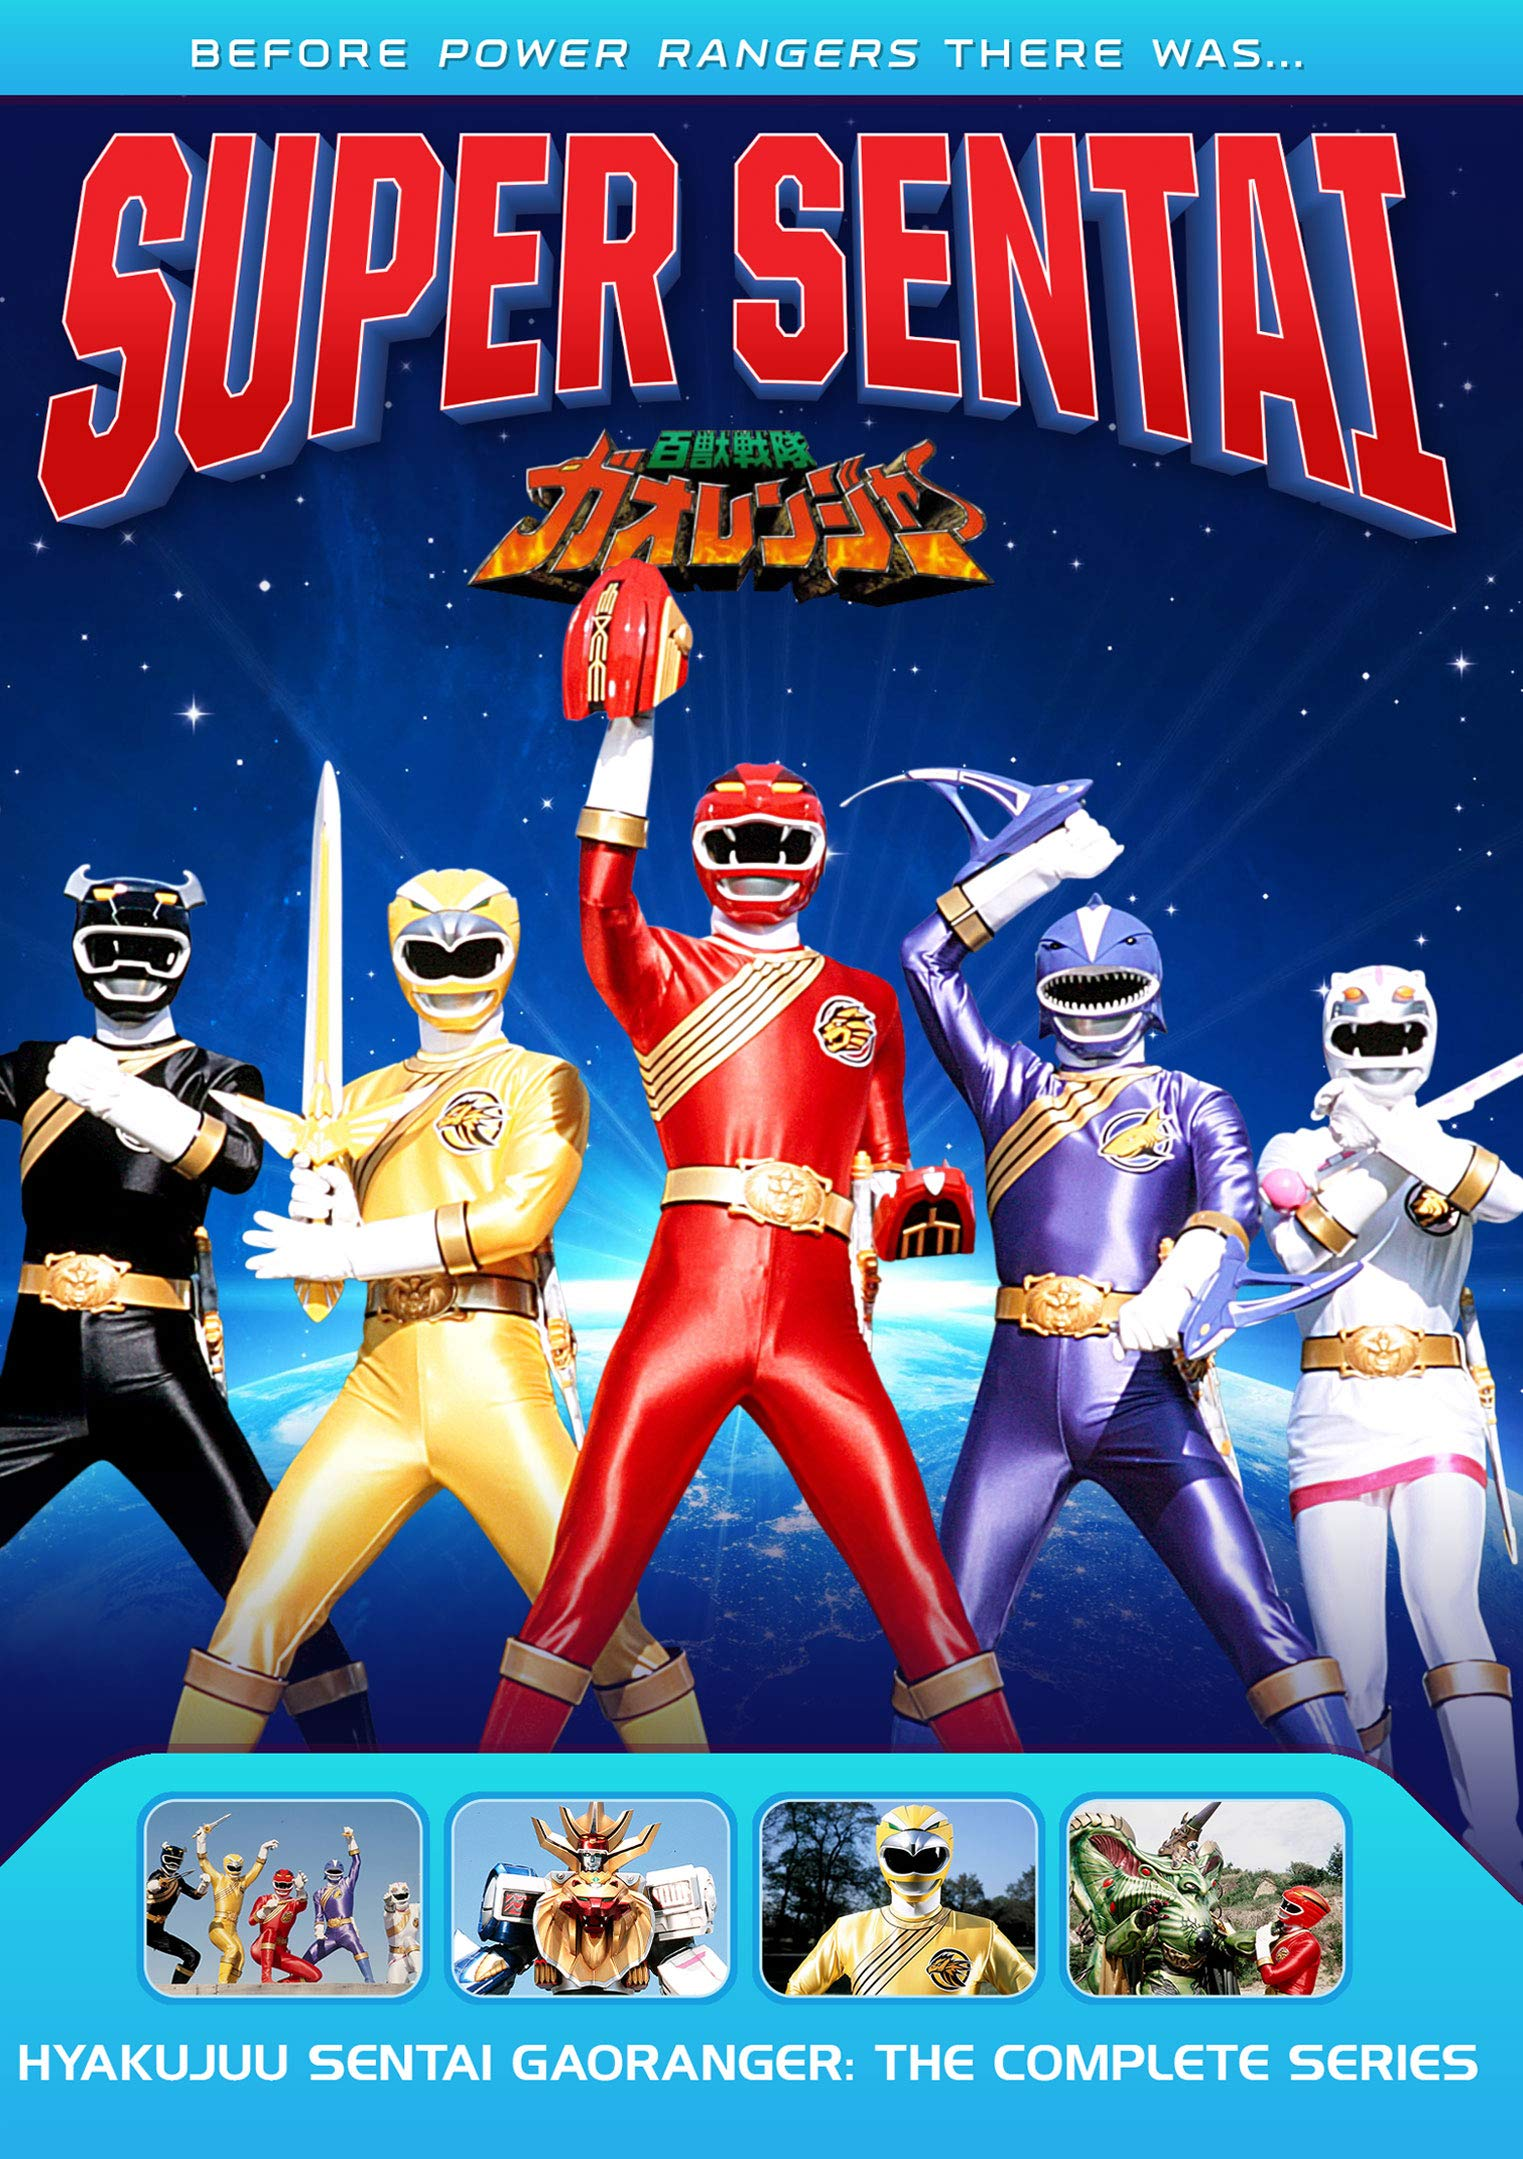 Power Rangers: Chojin Sentai Jetman - The Complete Series - Amazon